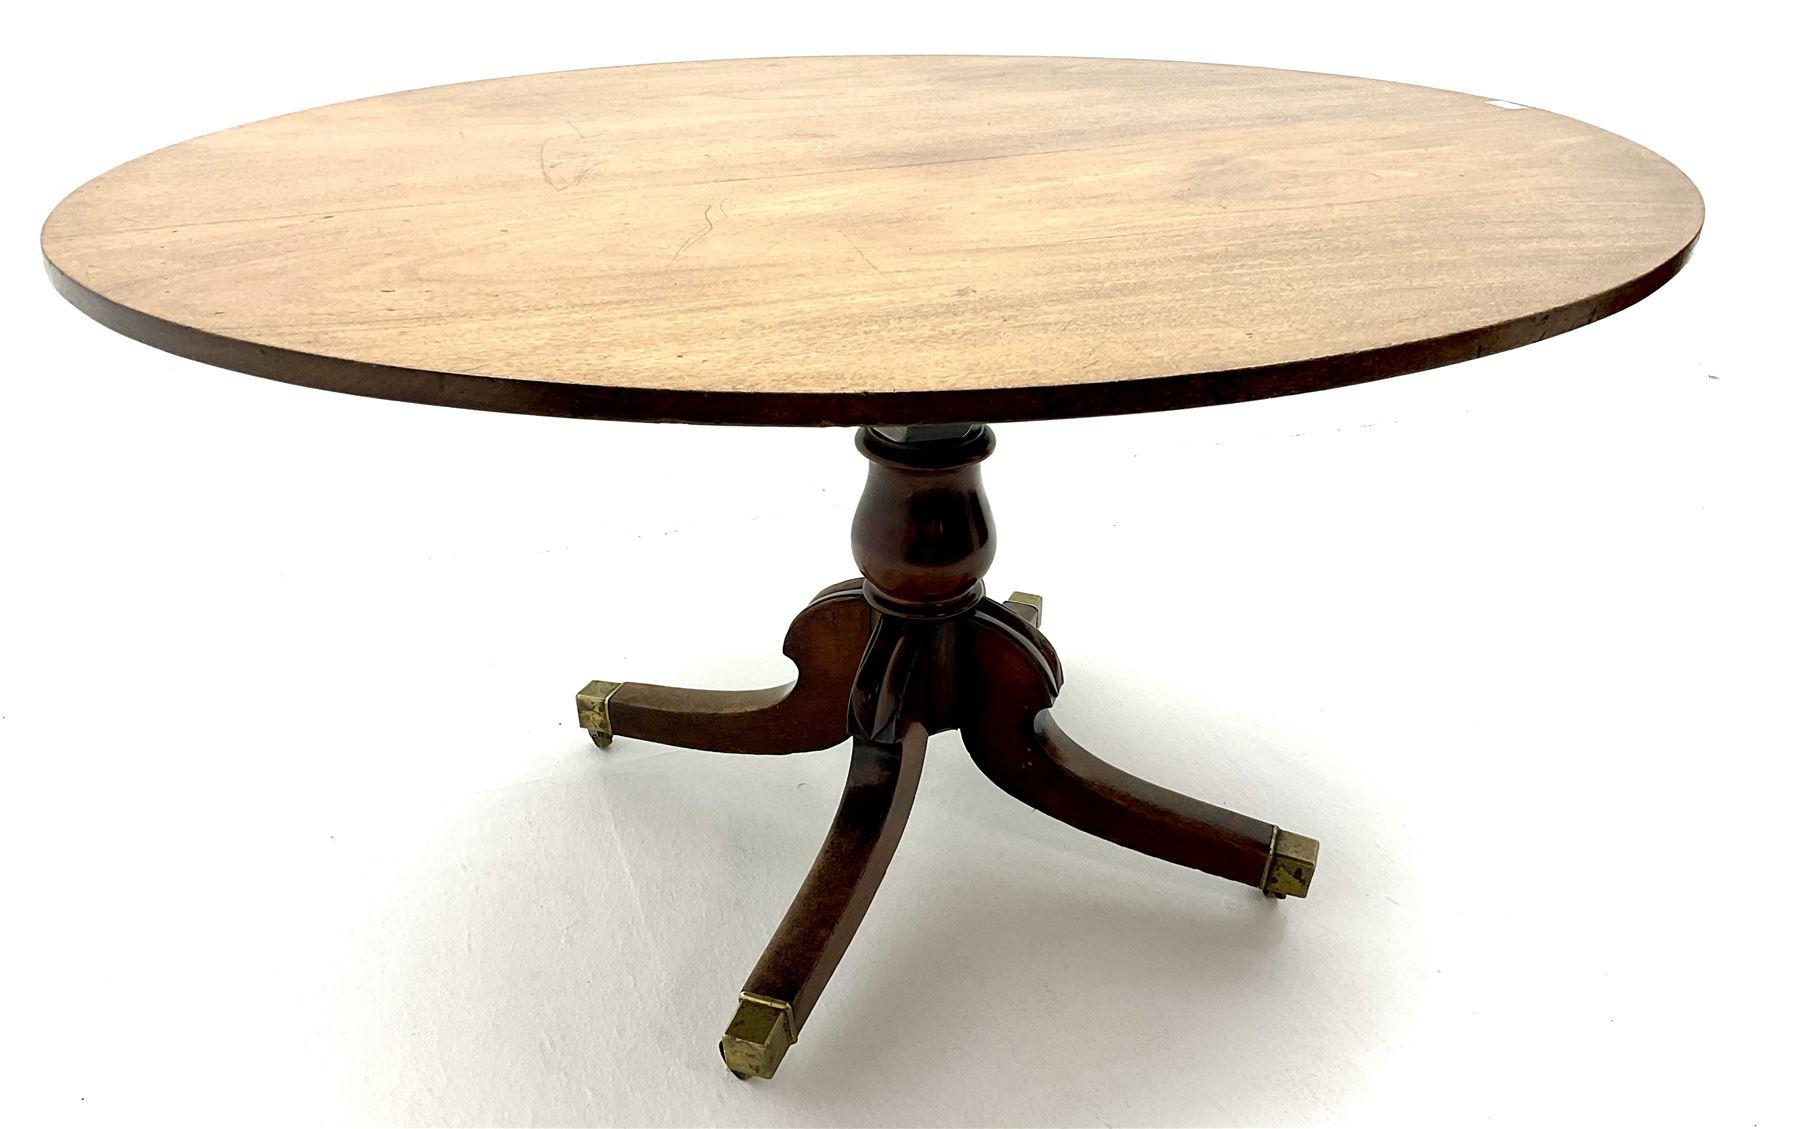 George III oval mahogany breakfast table